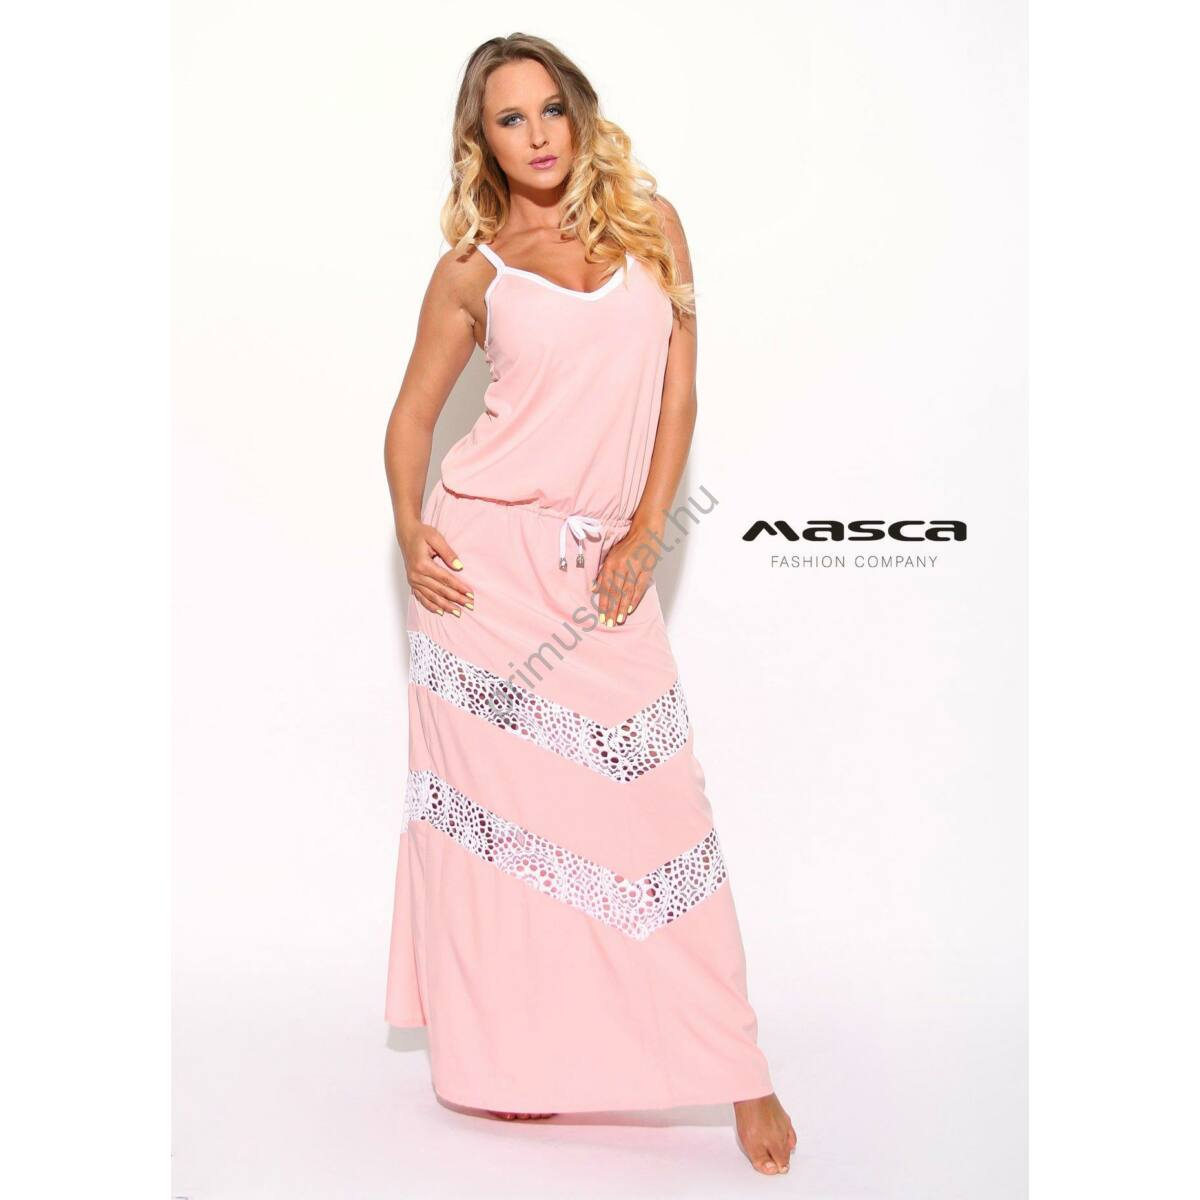 Kép 1 1 - Masca Fashion spagettipántos púder-rózsaszín maxi ruha 4c3df9bef9